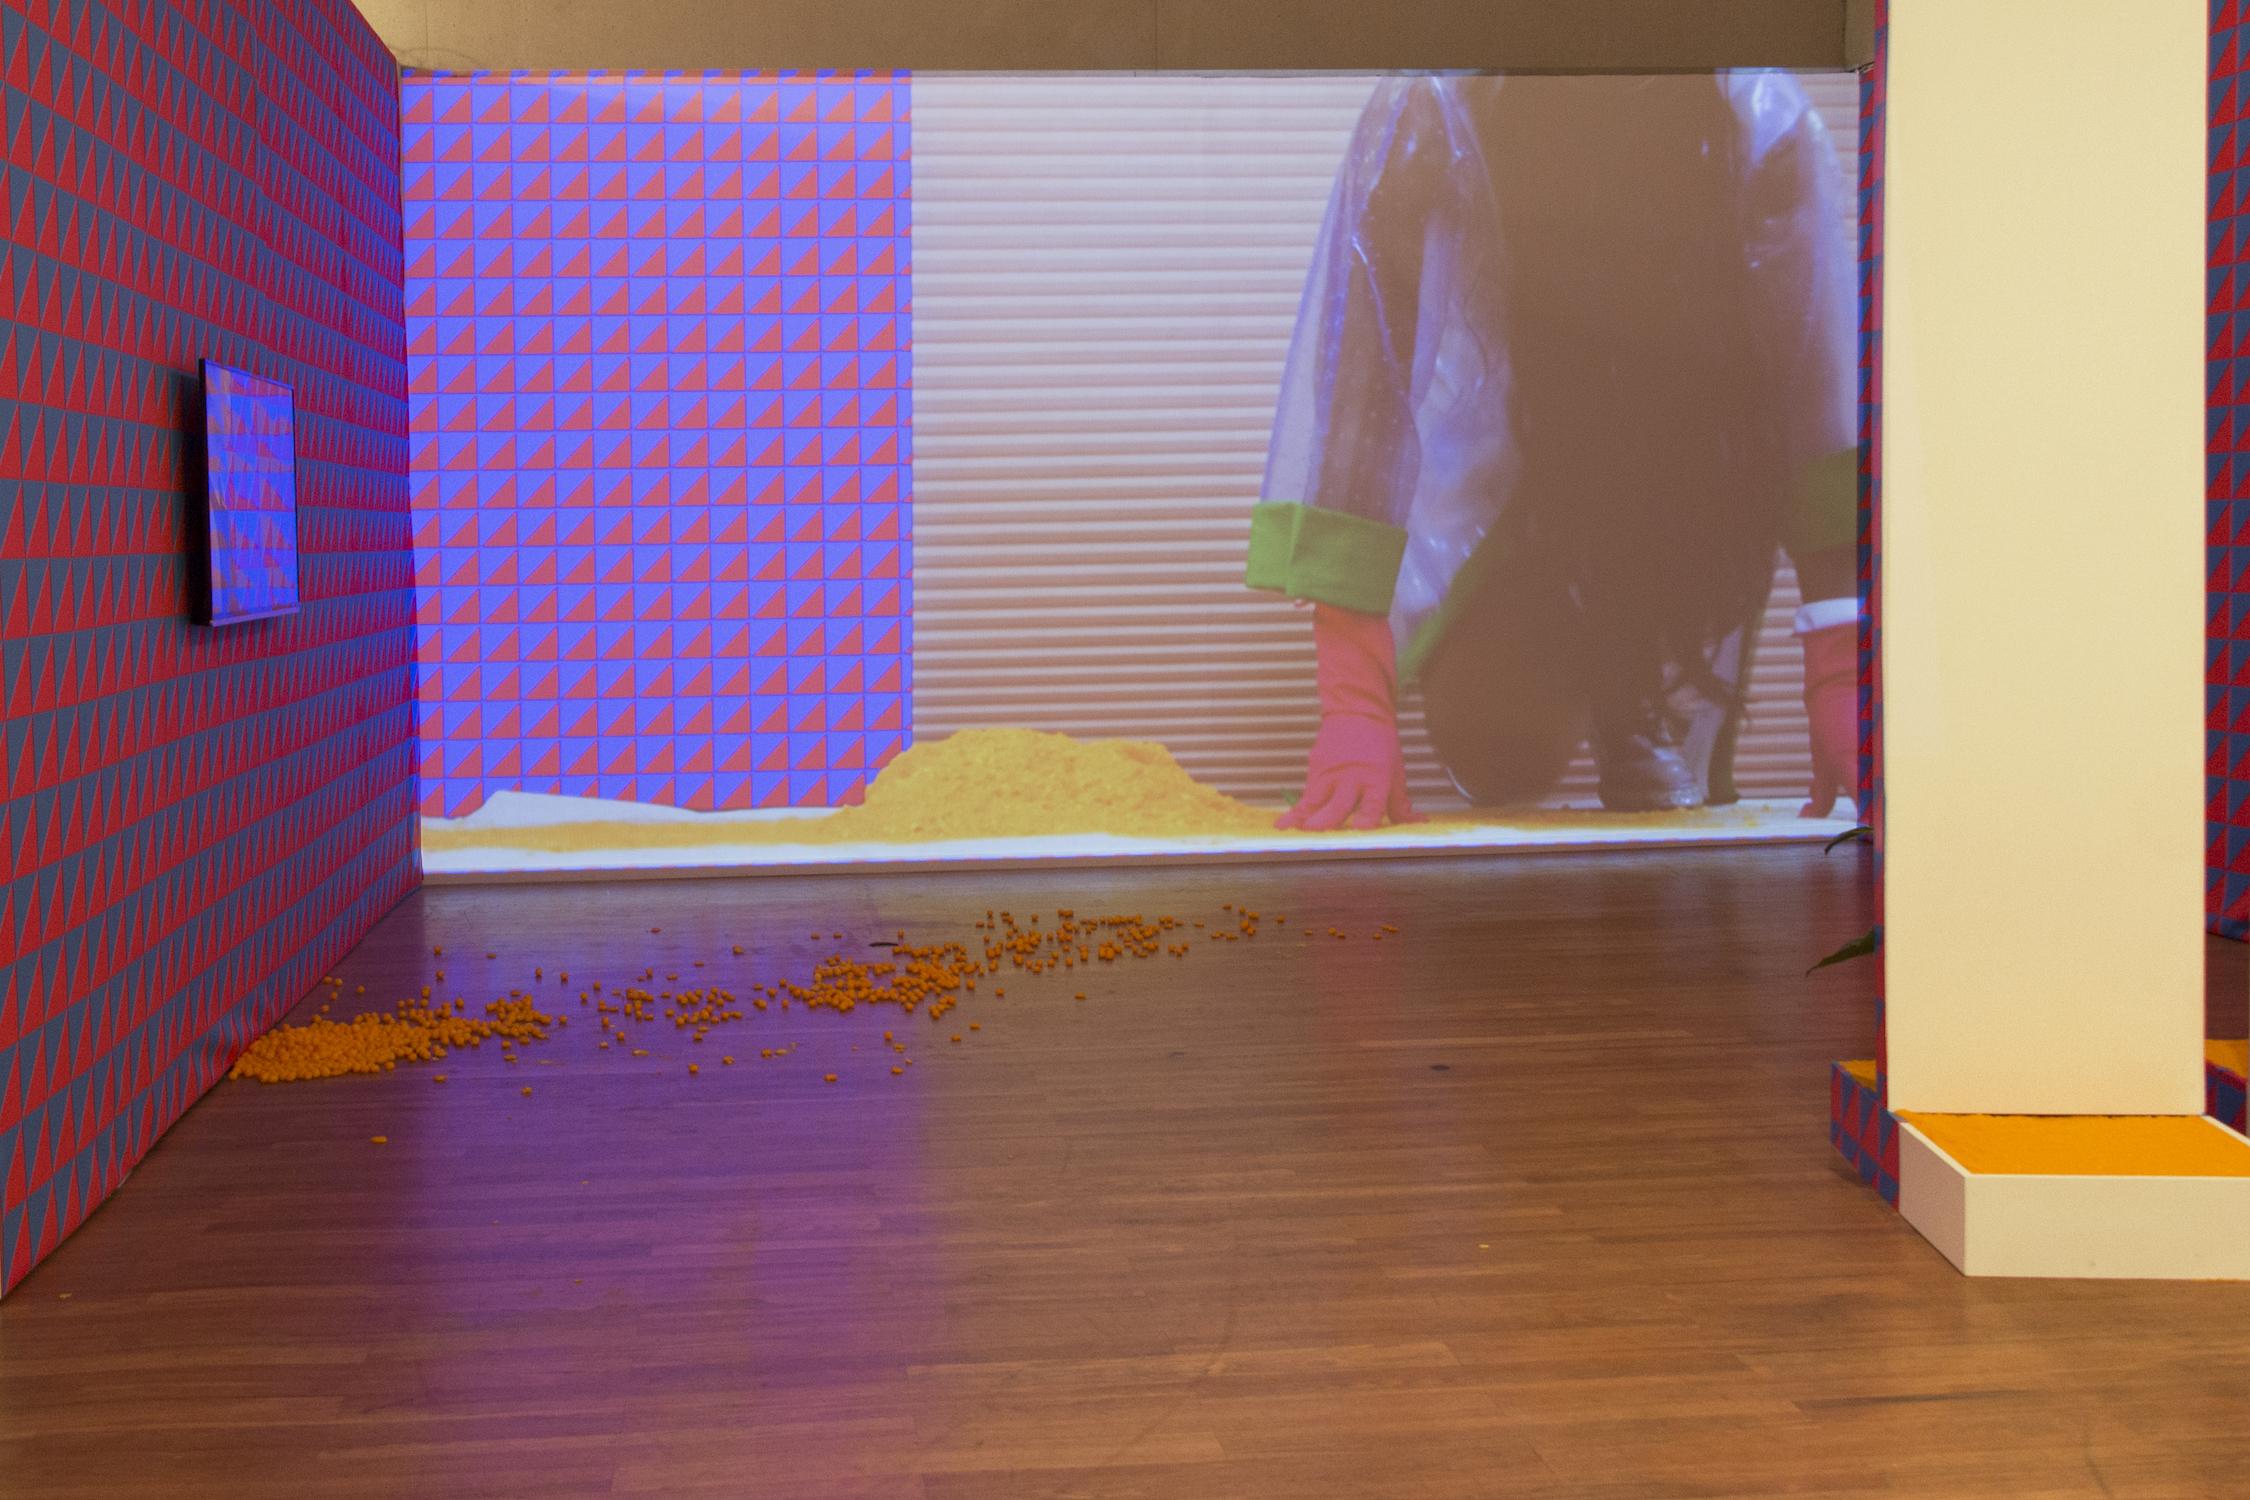 Jessica Gatlin, Here, A Vibration, mixed media installation, dimensions variable, 2017